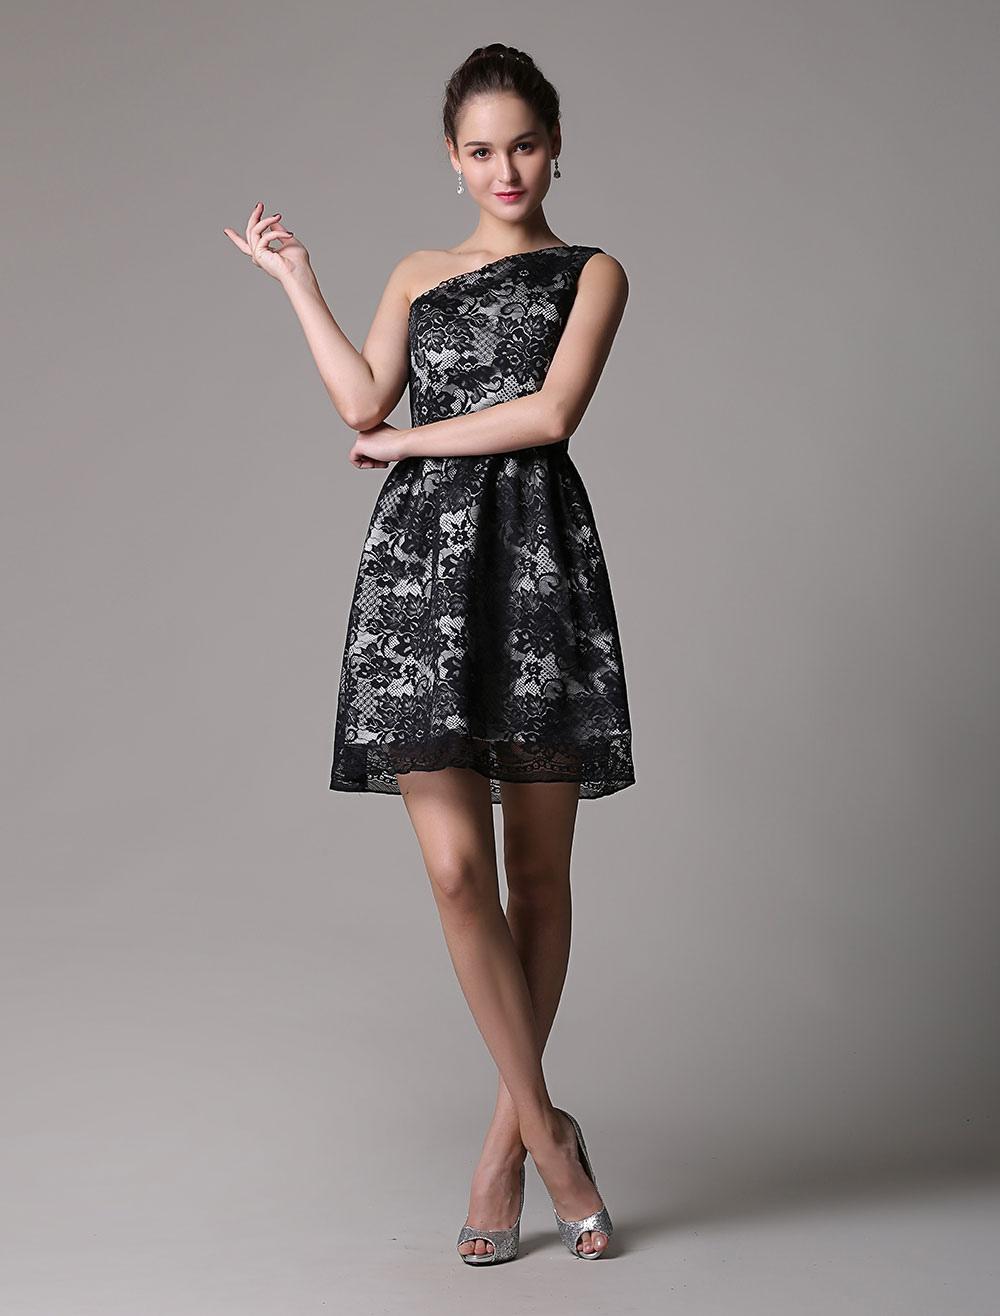 Black Soft Lace One Shoulder Short Dress (Wedding Cheap Party Dress) photo